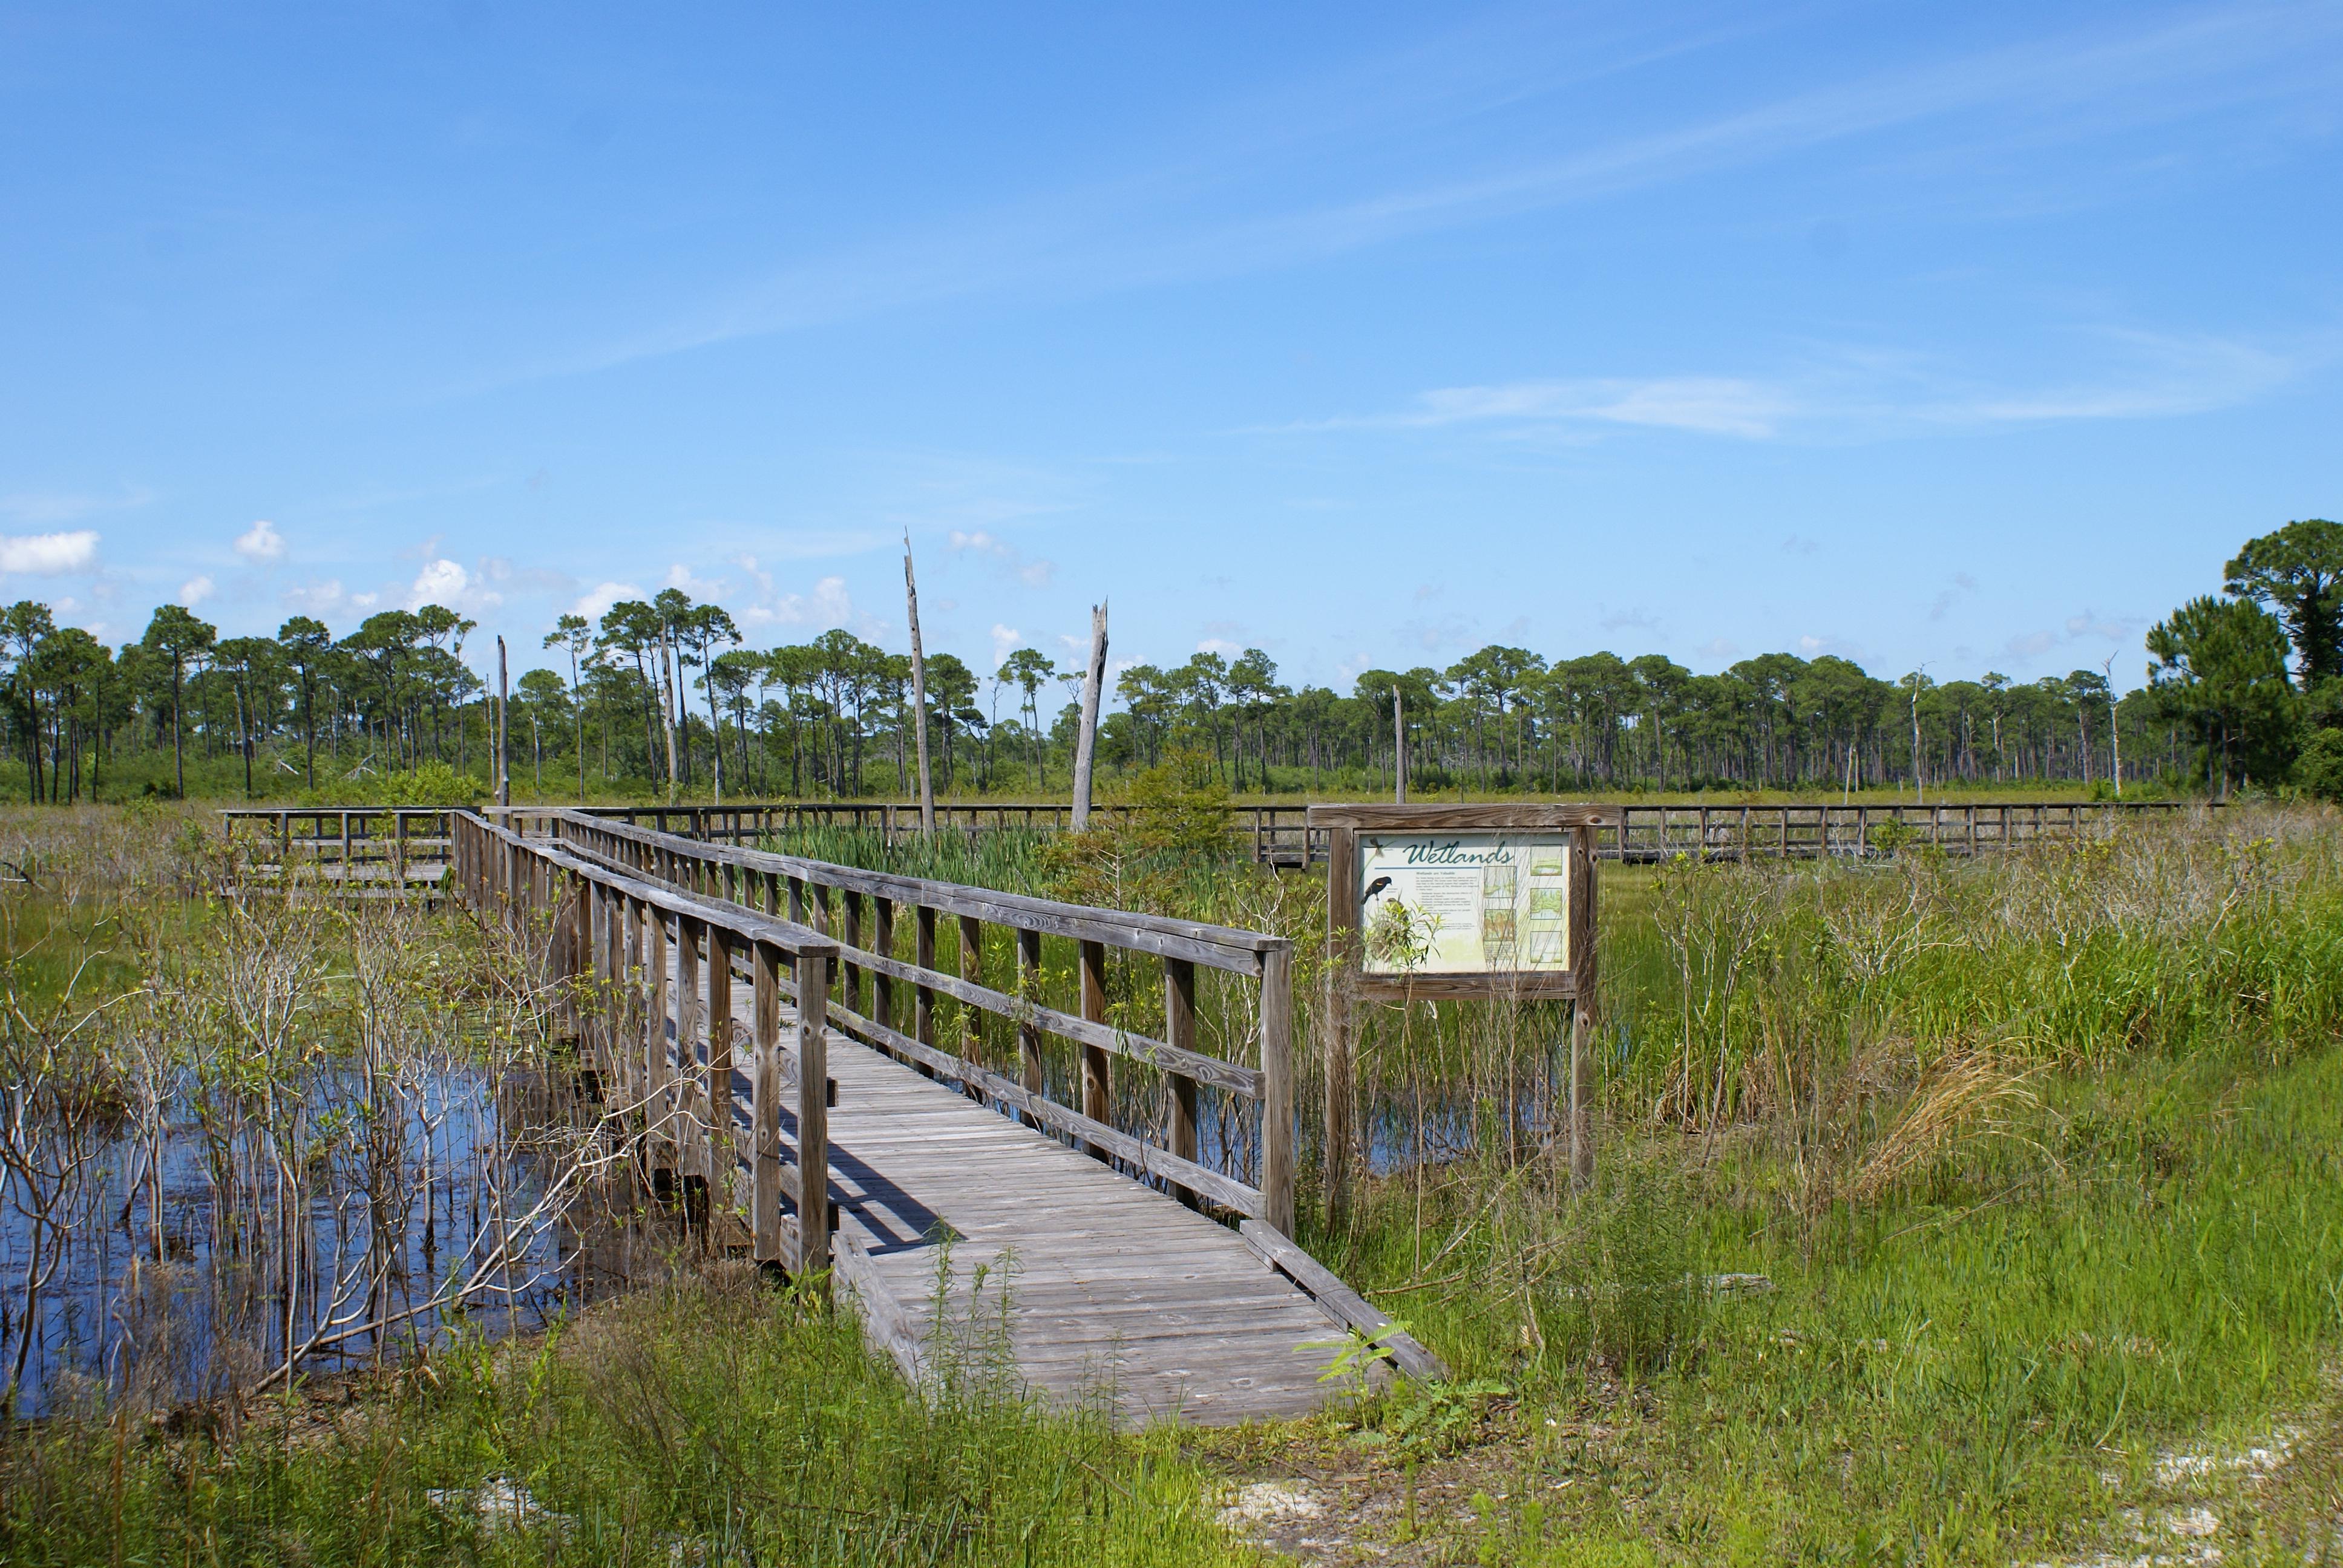 A boardwalk meandering through Alabama wetlands, with an interpretive sign.